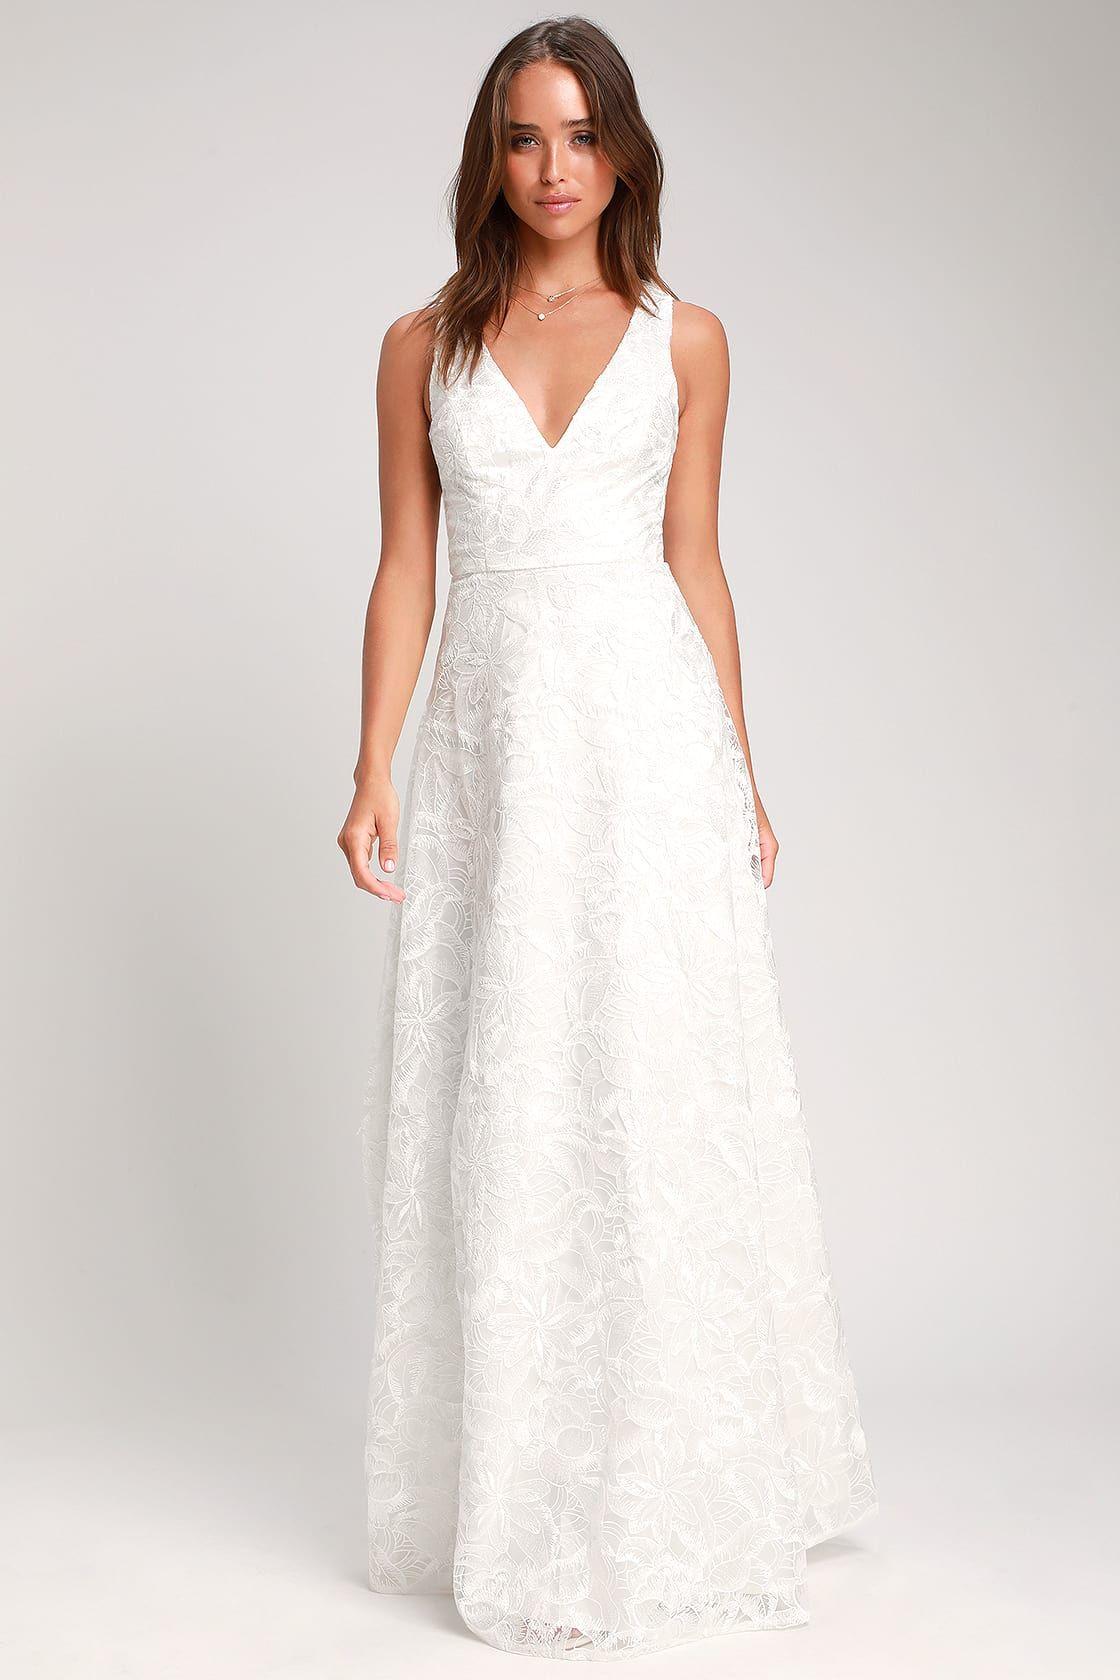 612c44ab691 Fausta White Embroidered Sleeveless Maxi Dress